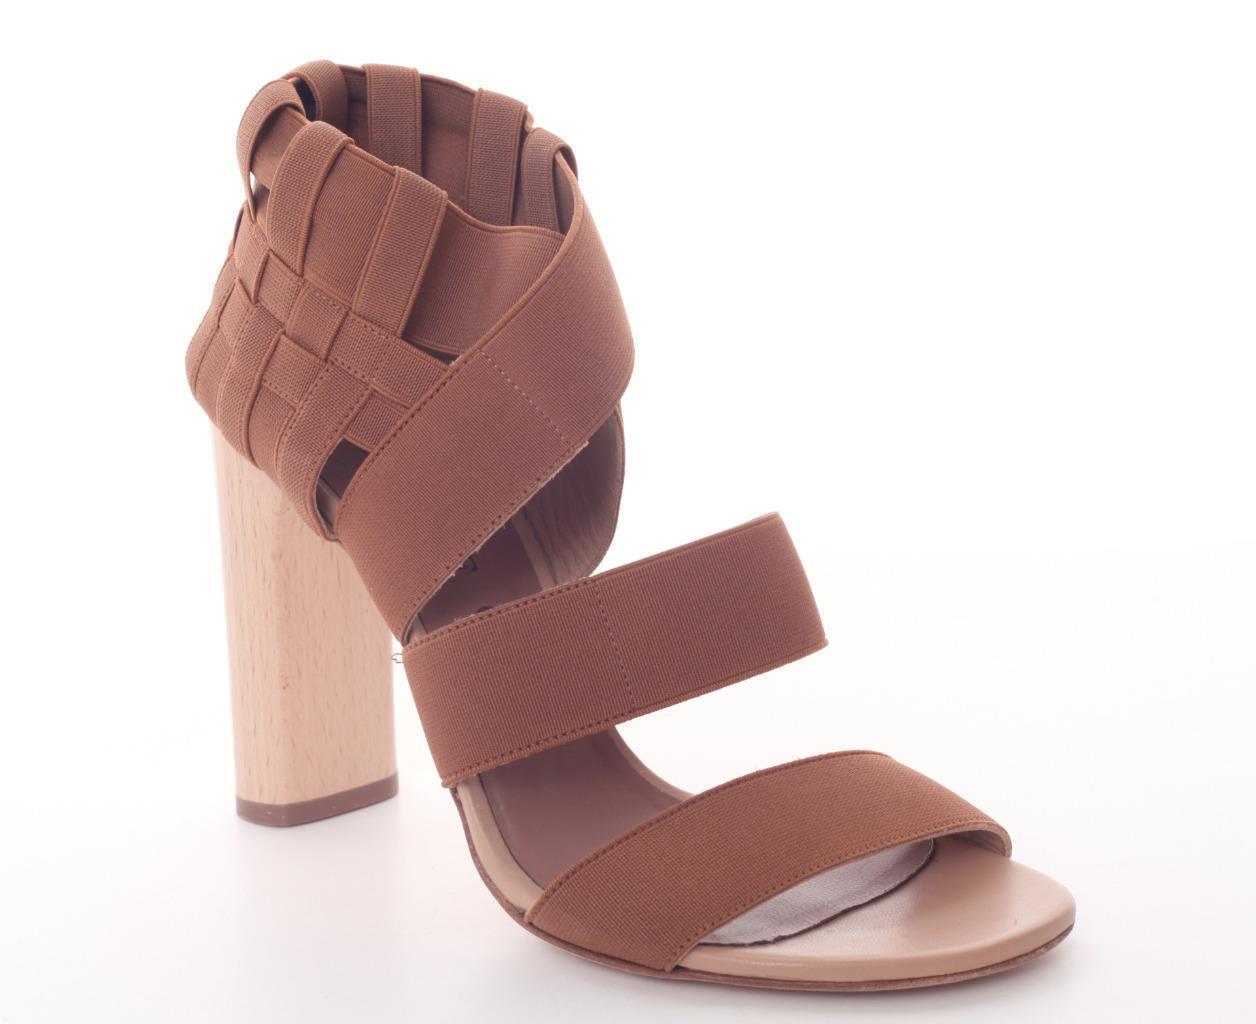 ACROBATS OF GOD Brown Brown GOD Elastic High Heel Cuff CHEROKEE Sandal Pump NEW $528 e2368b